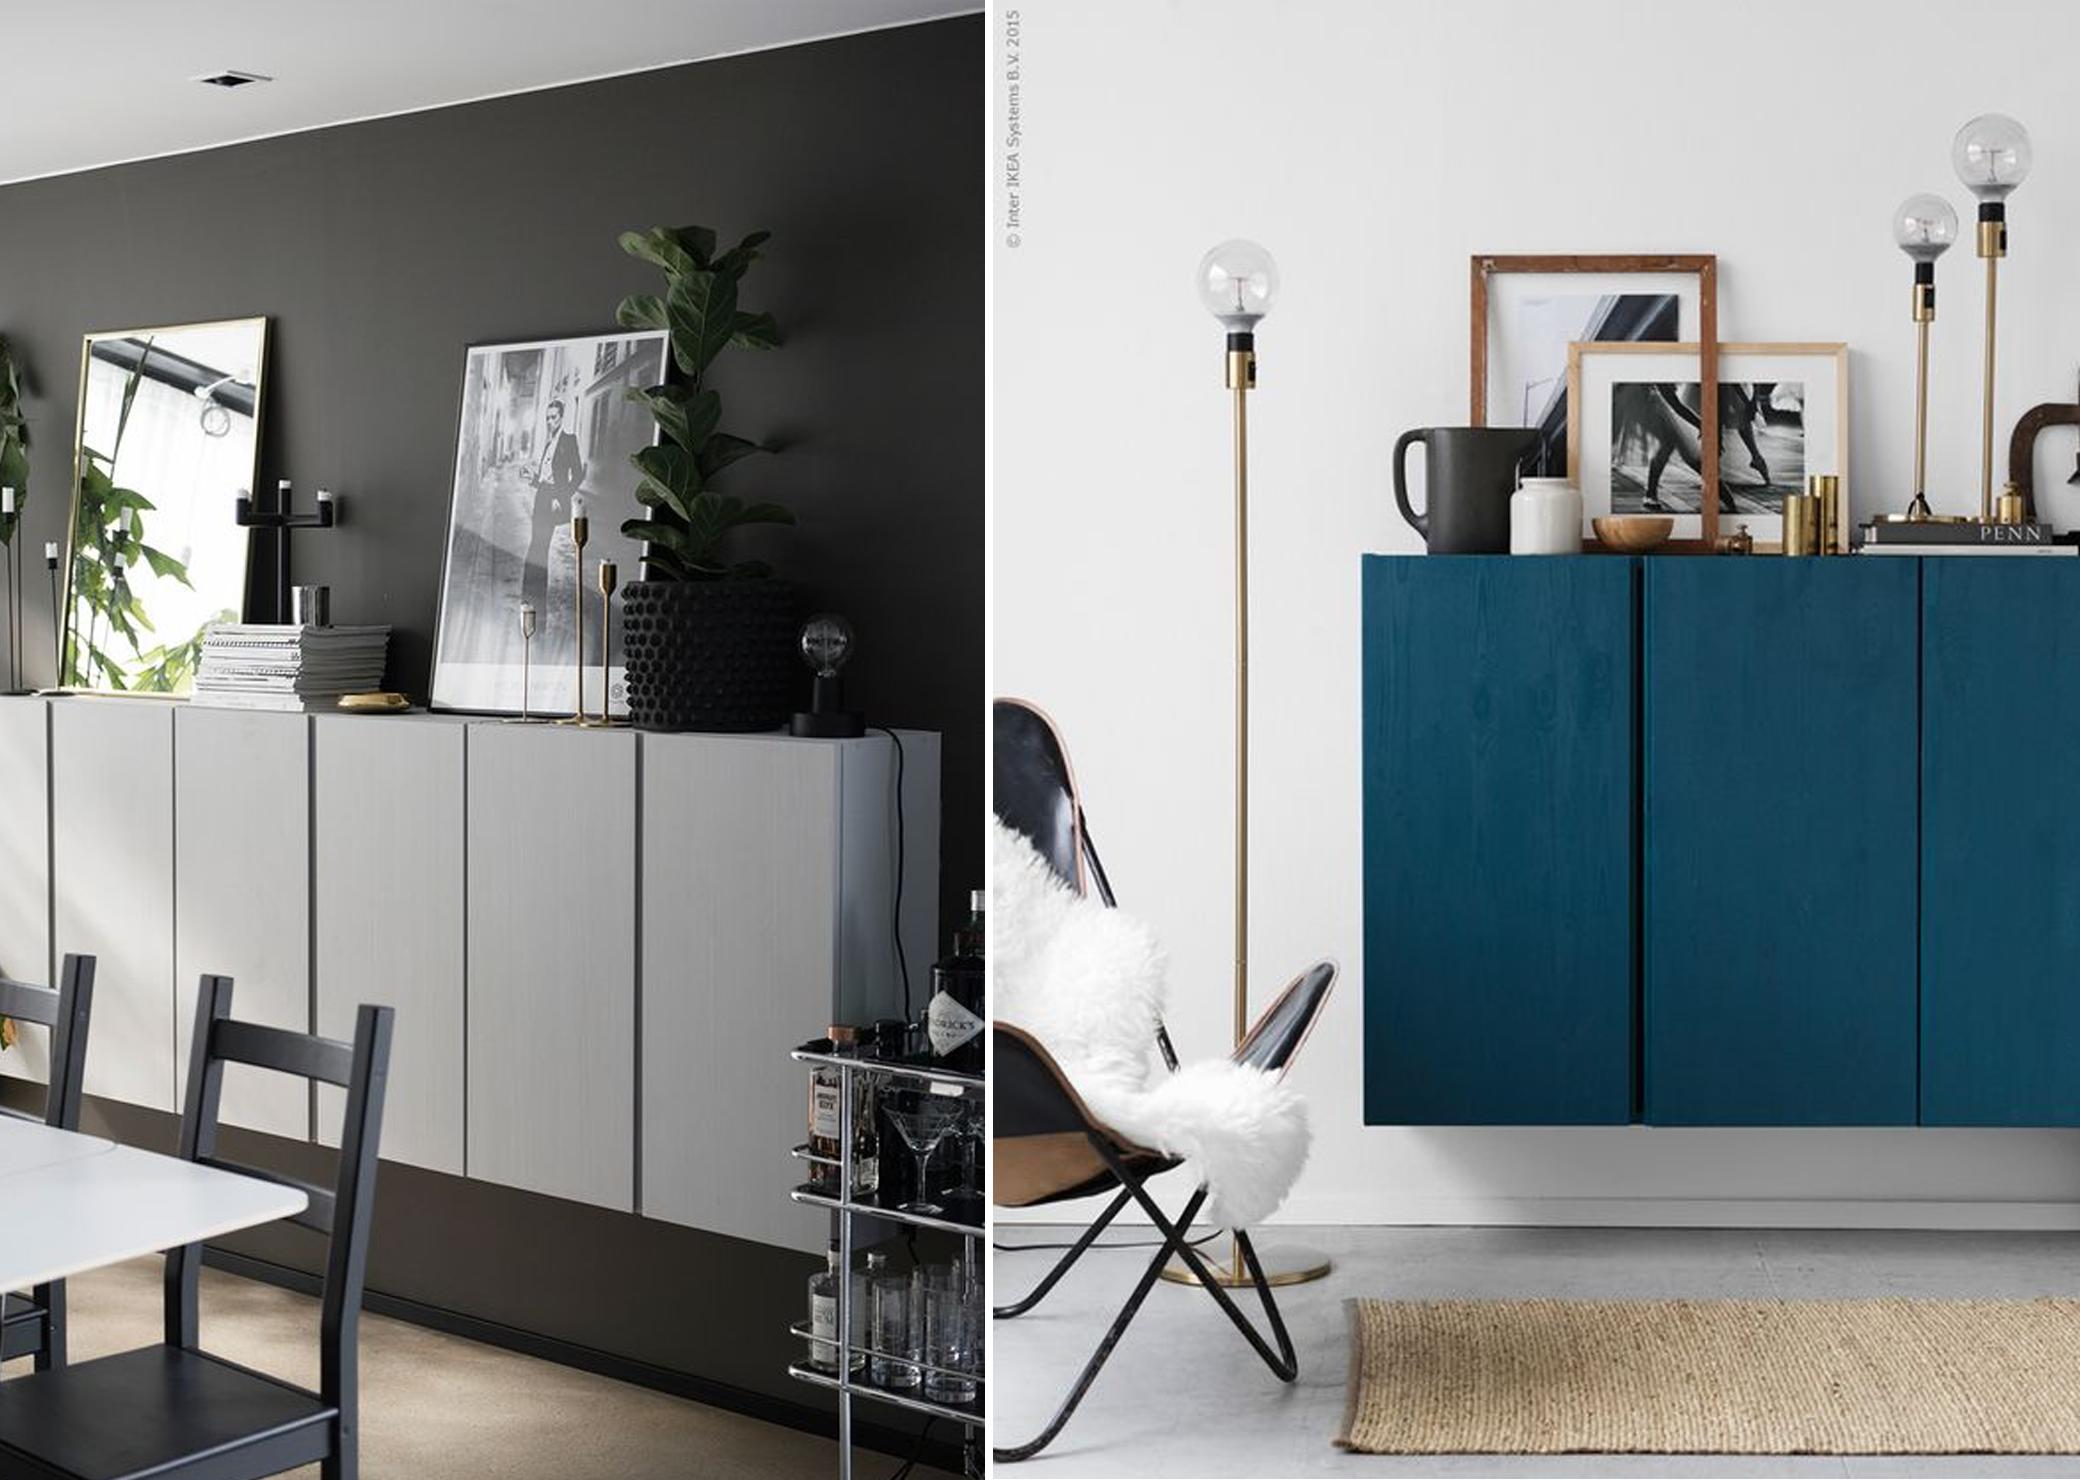 Ikea Credenza Black : Ikea ivar our bedroom inspirations